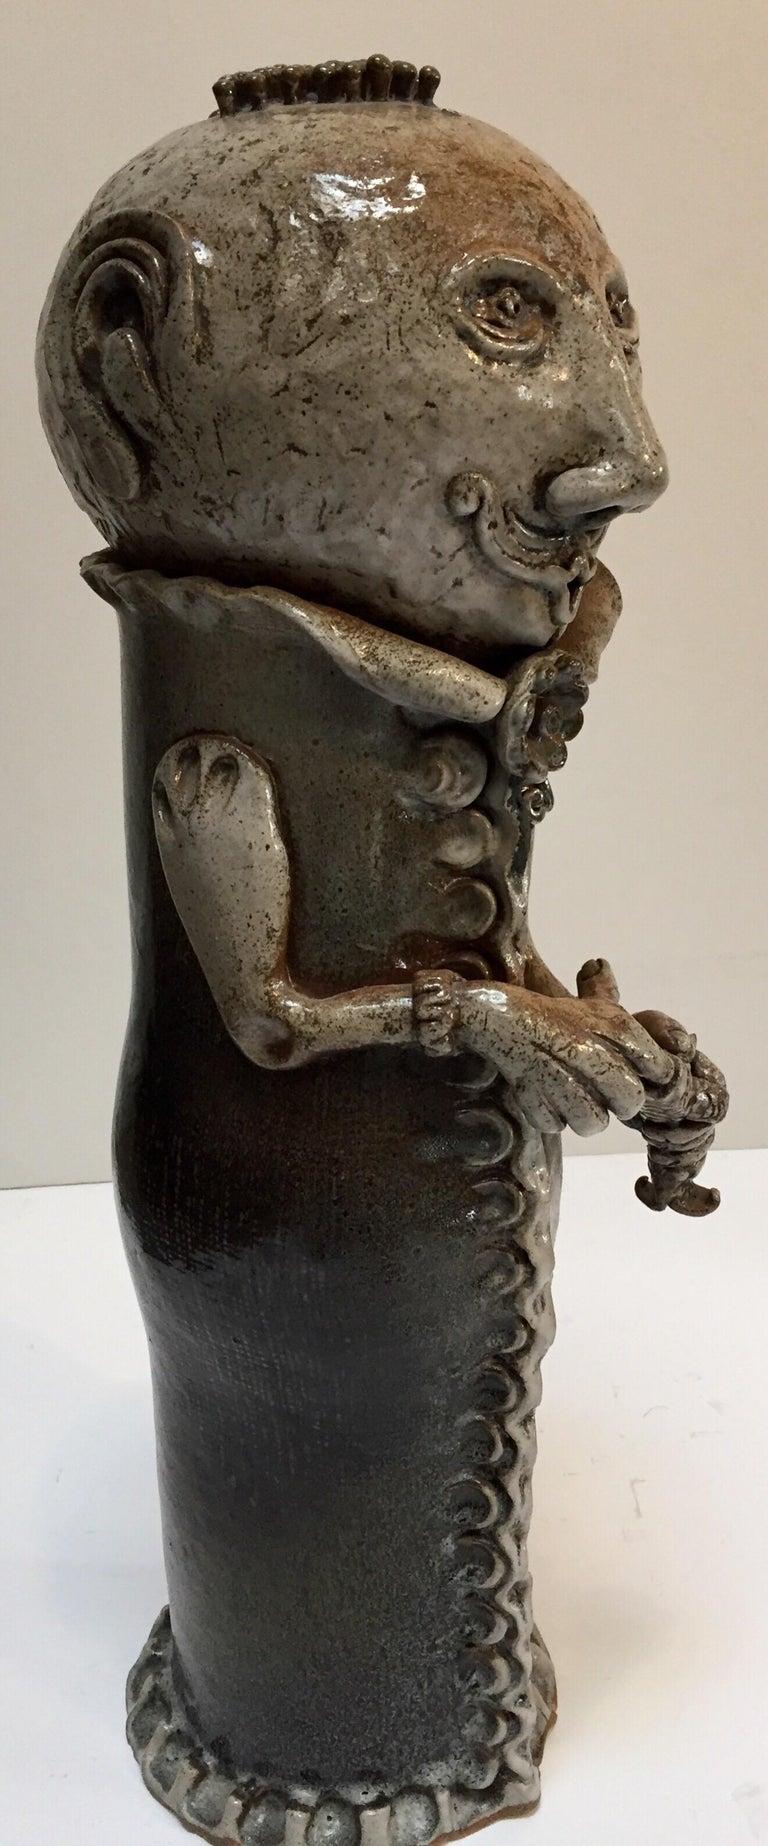 Brutalist Ceramic Sculpture Art Studio Pop Surrealist Fantasy Figure Signed For Sale 3